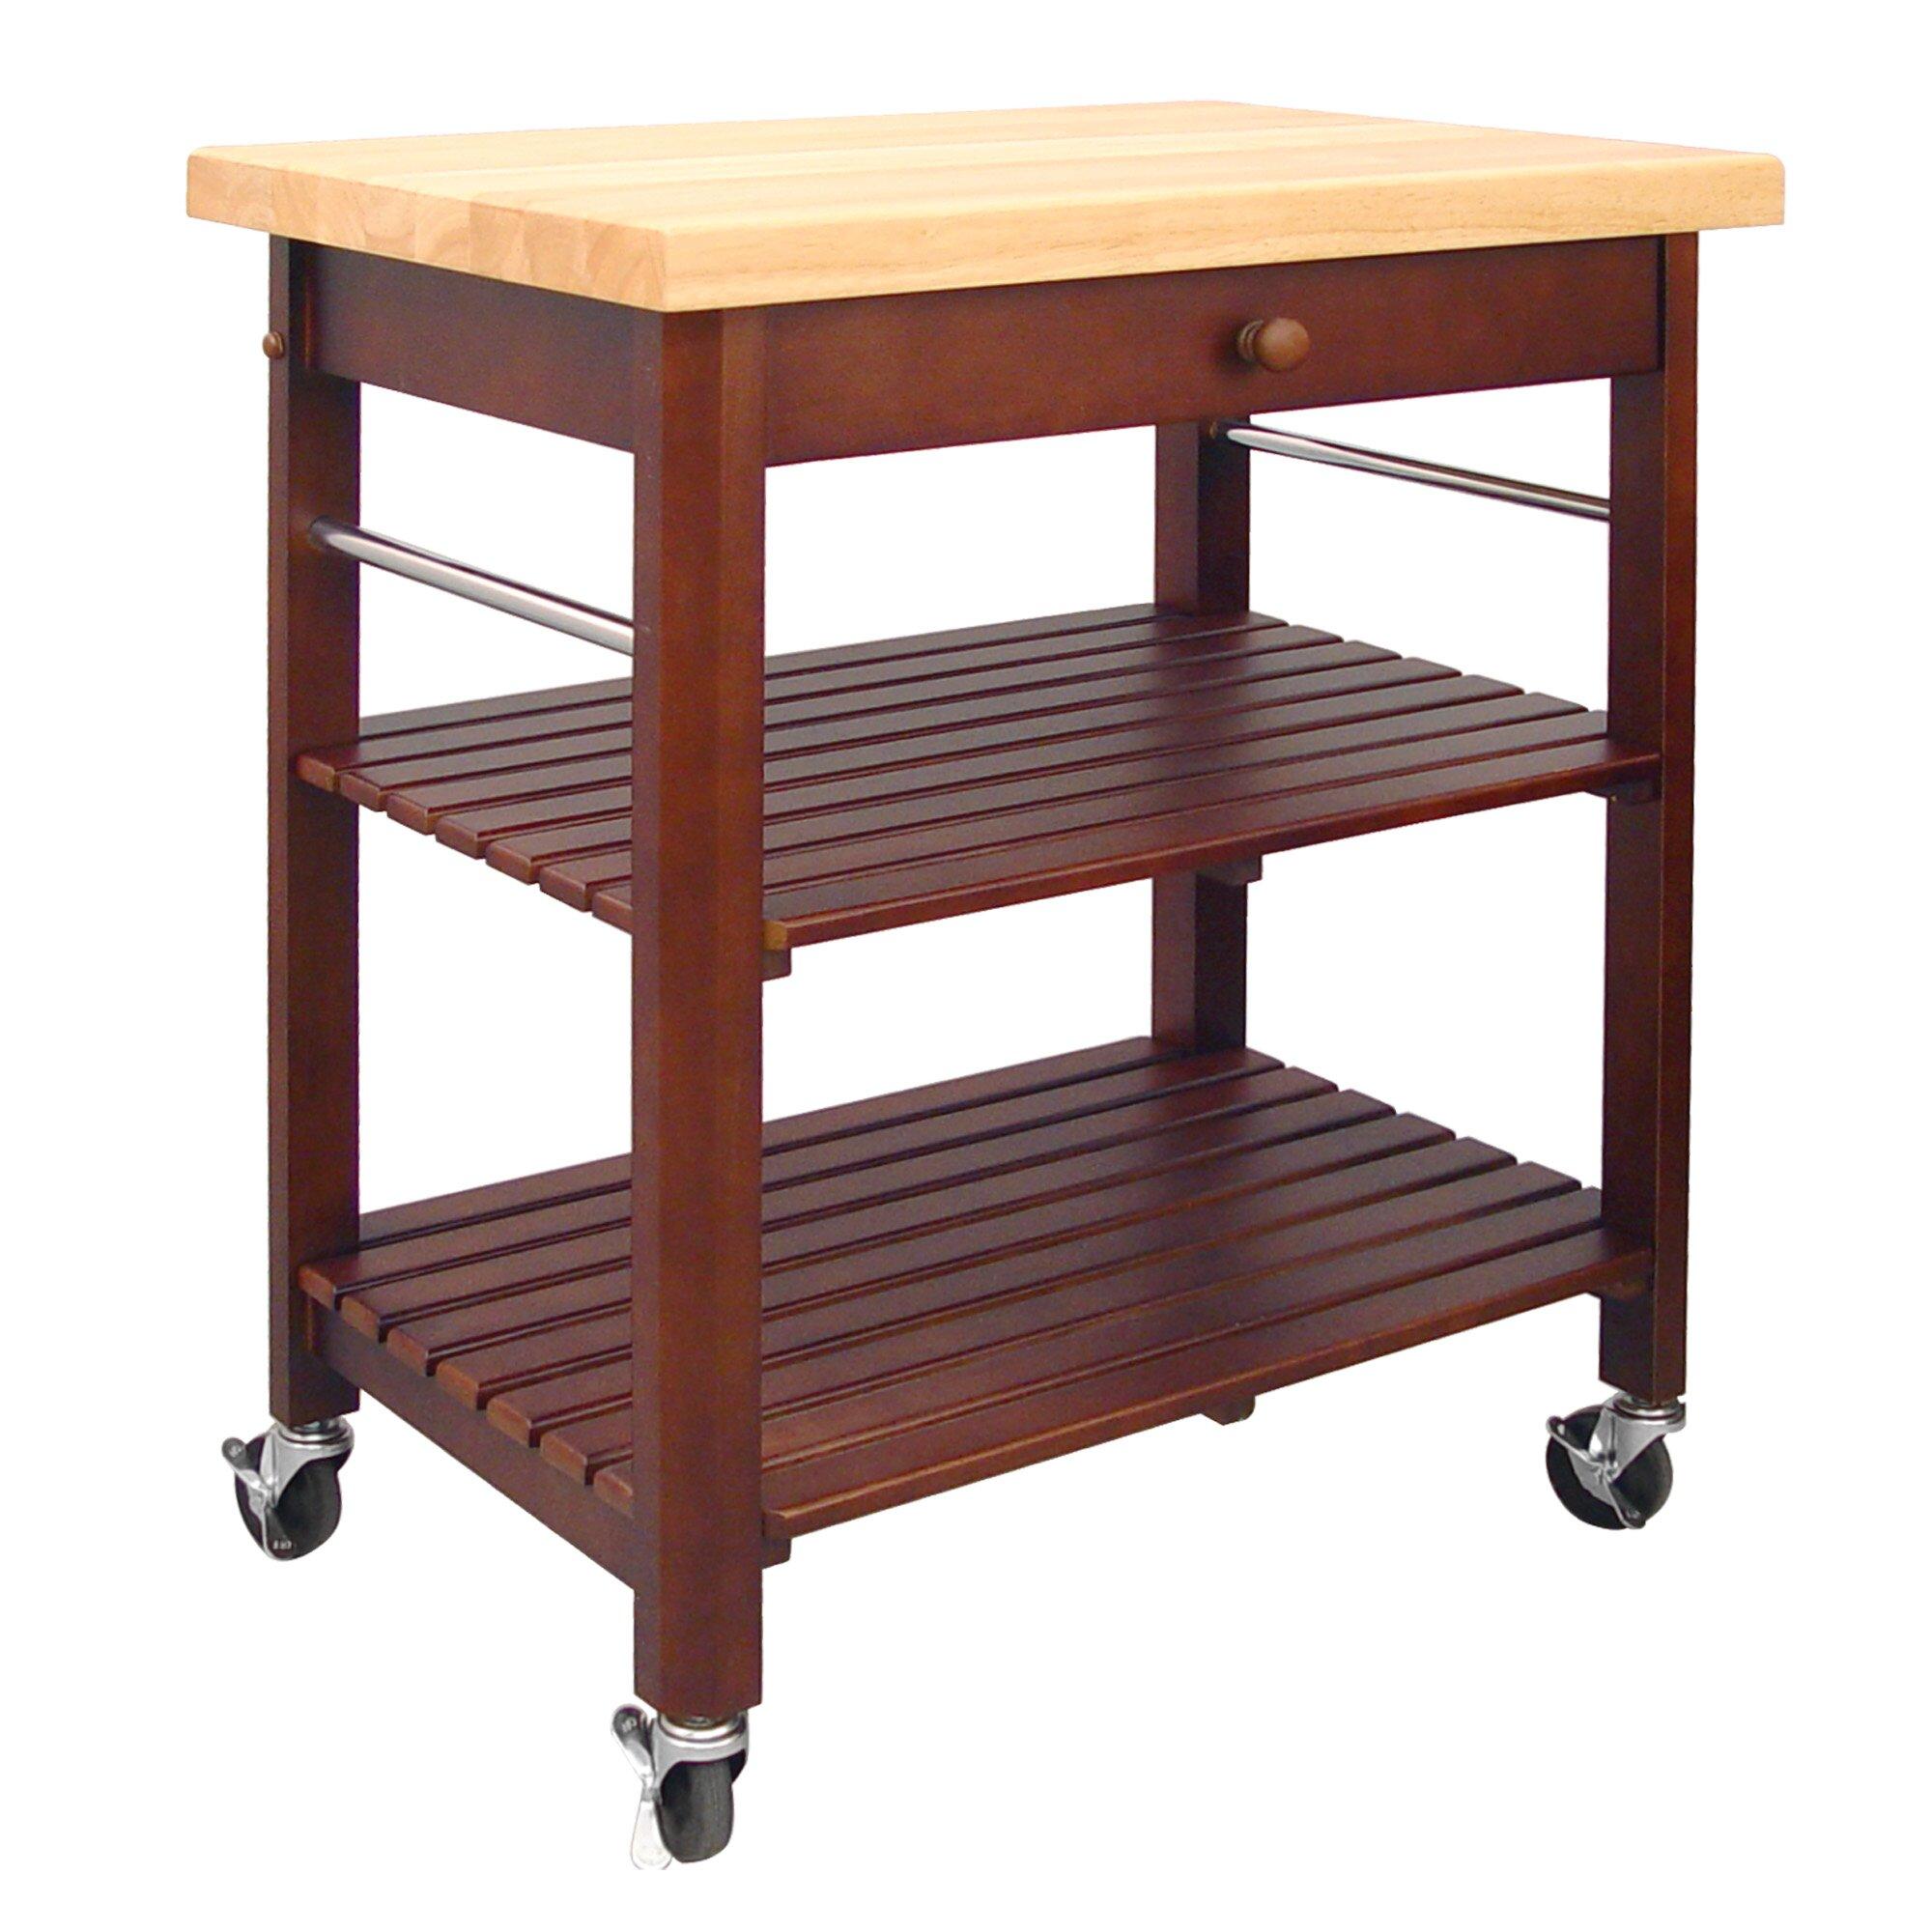 Catskill Craftsmen Kitchen Cart: Catskill Craftsmen Roll About Kitchen Cart With Wood Top